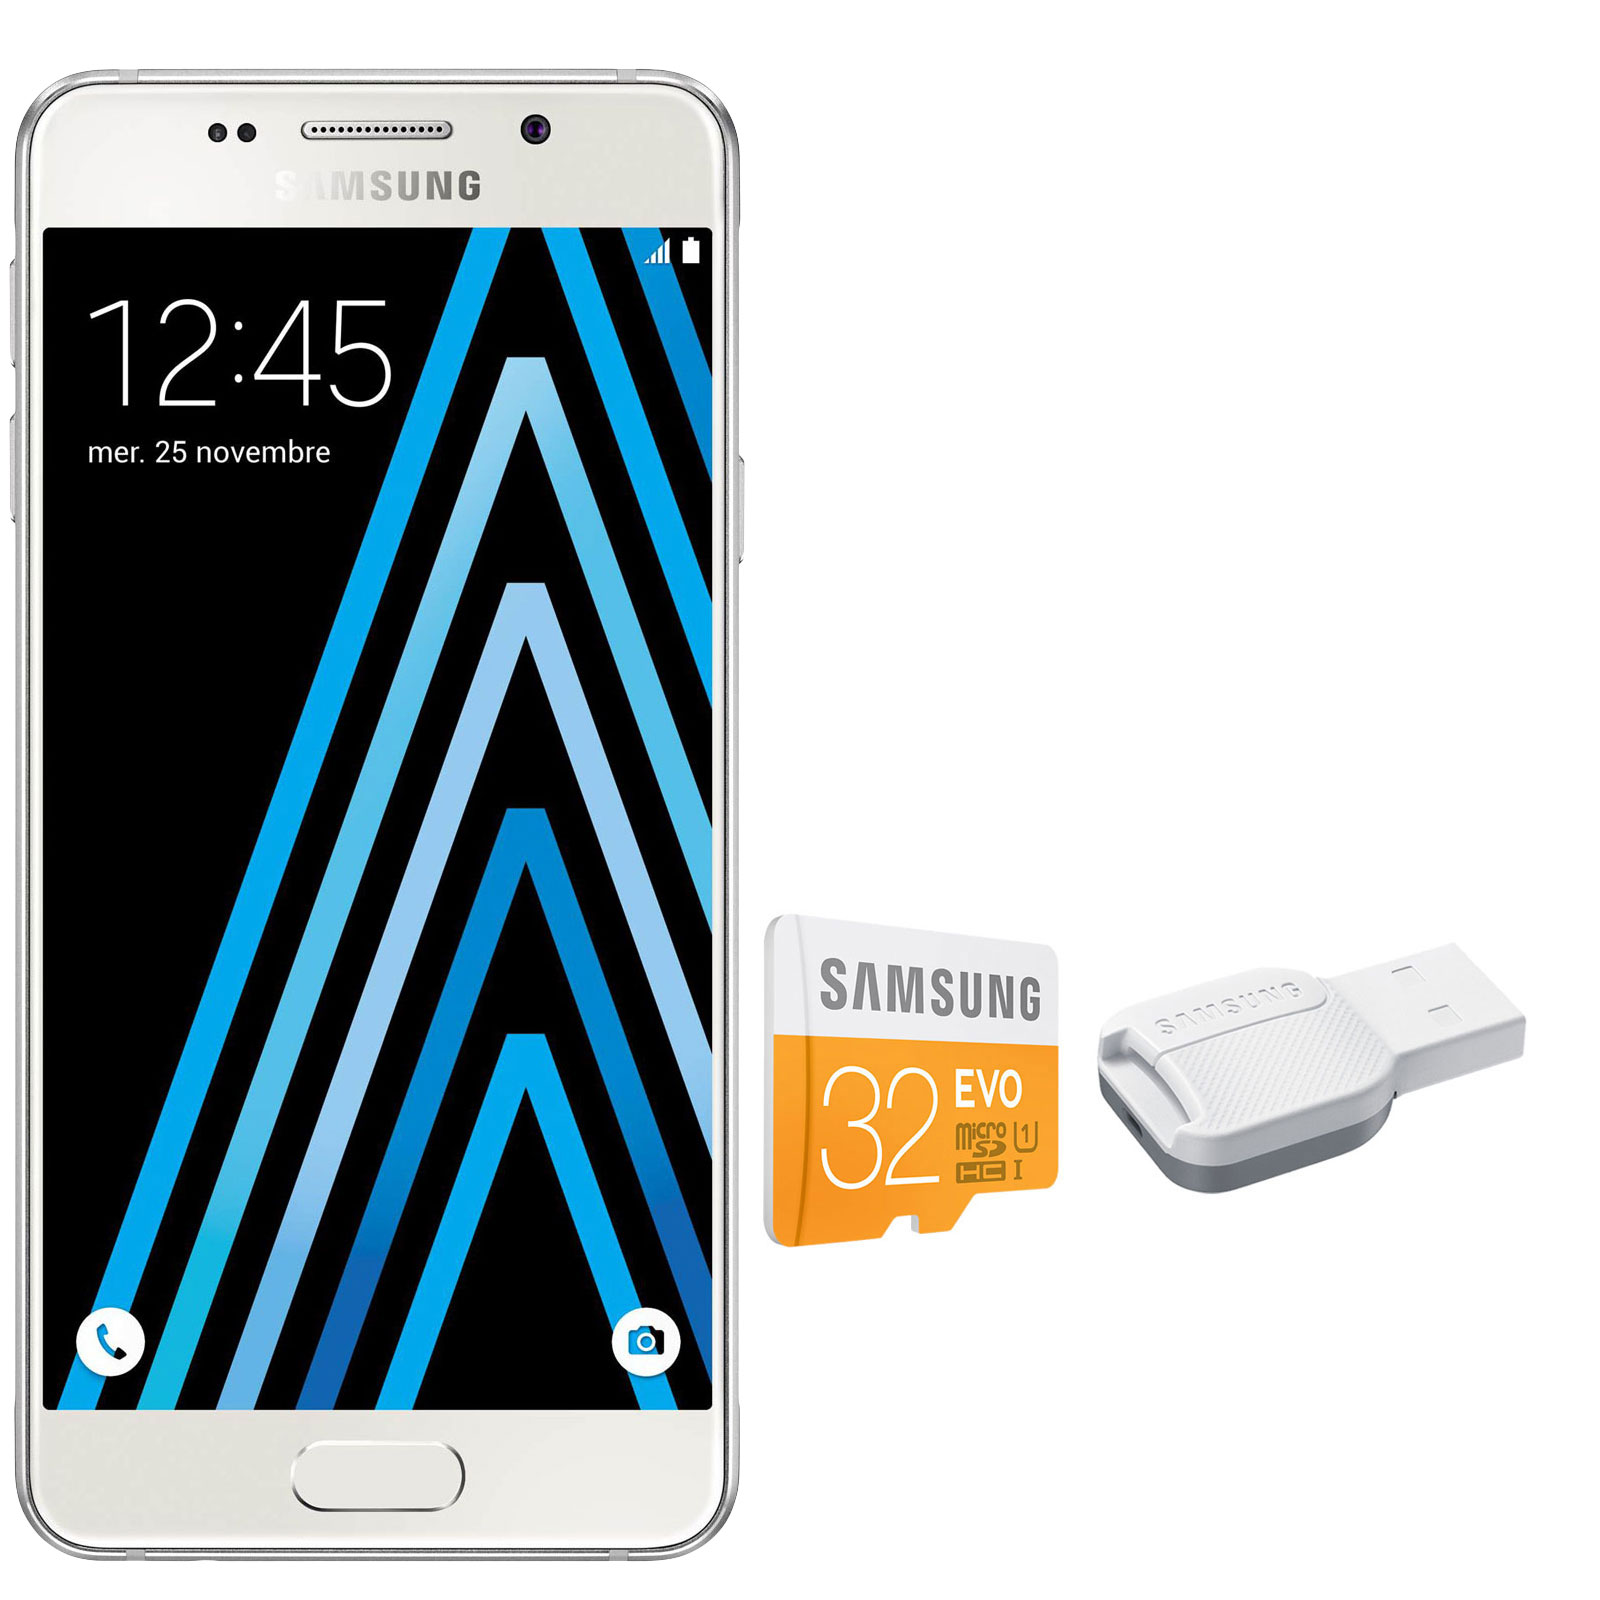 samsung galaxy a3 2016 blanc microsdhc 32 go mobile smartphone samsung sur. Black Bedroom Furniture Sets. Home Design Ideas